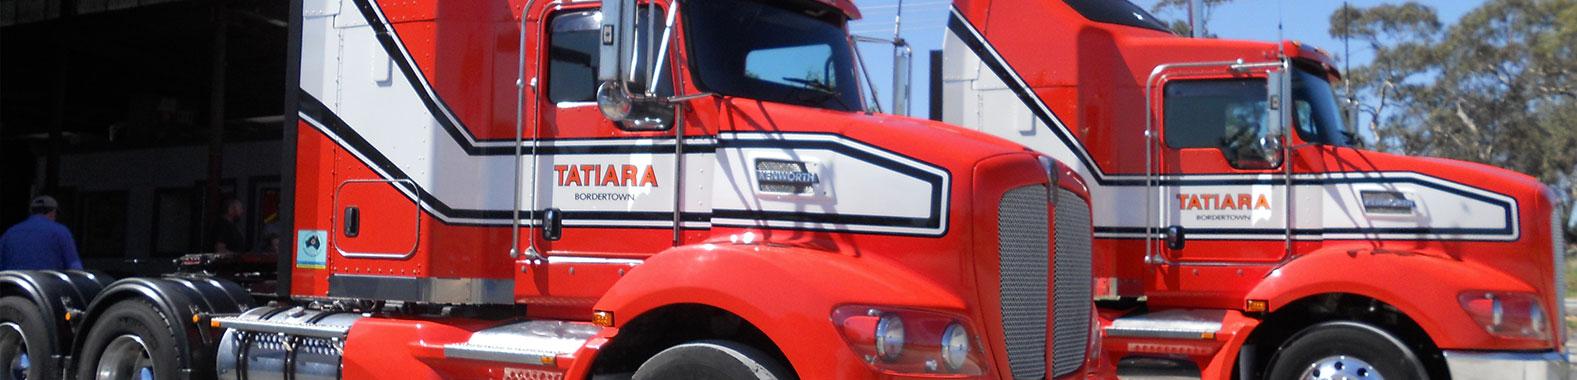 Tatiara Transport Truck 2